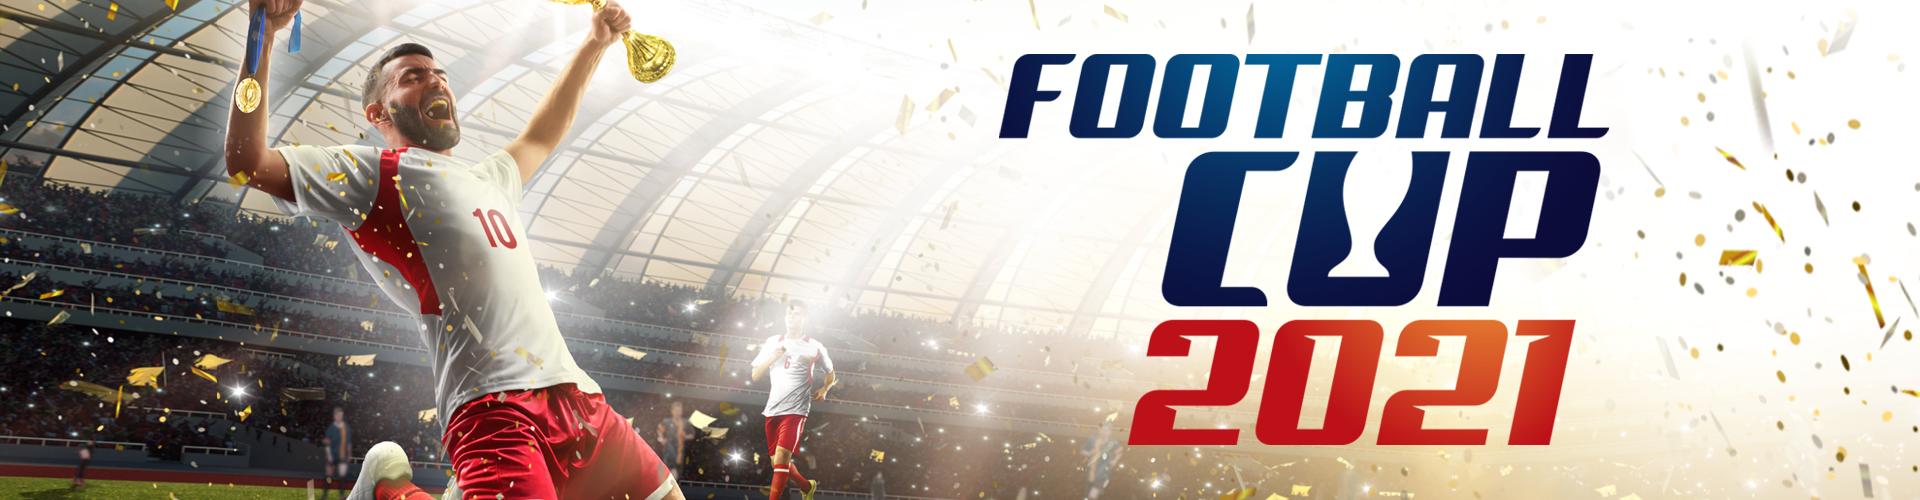 web_banner_FC_2021